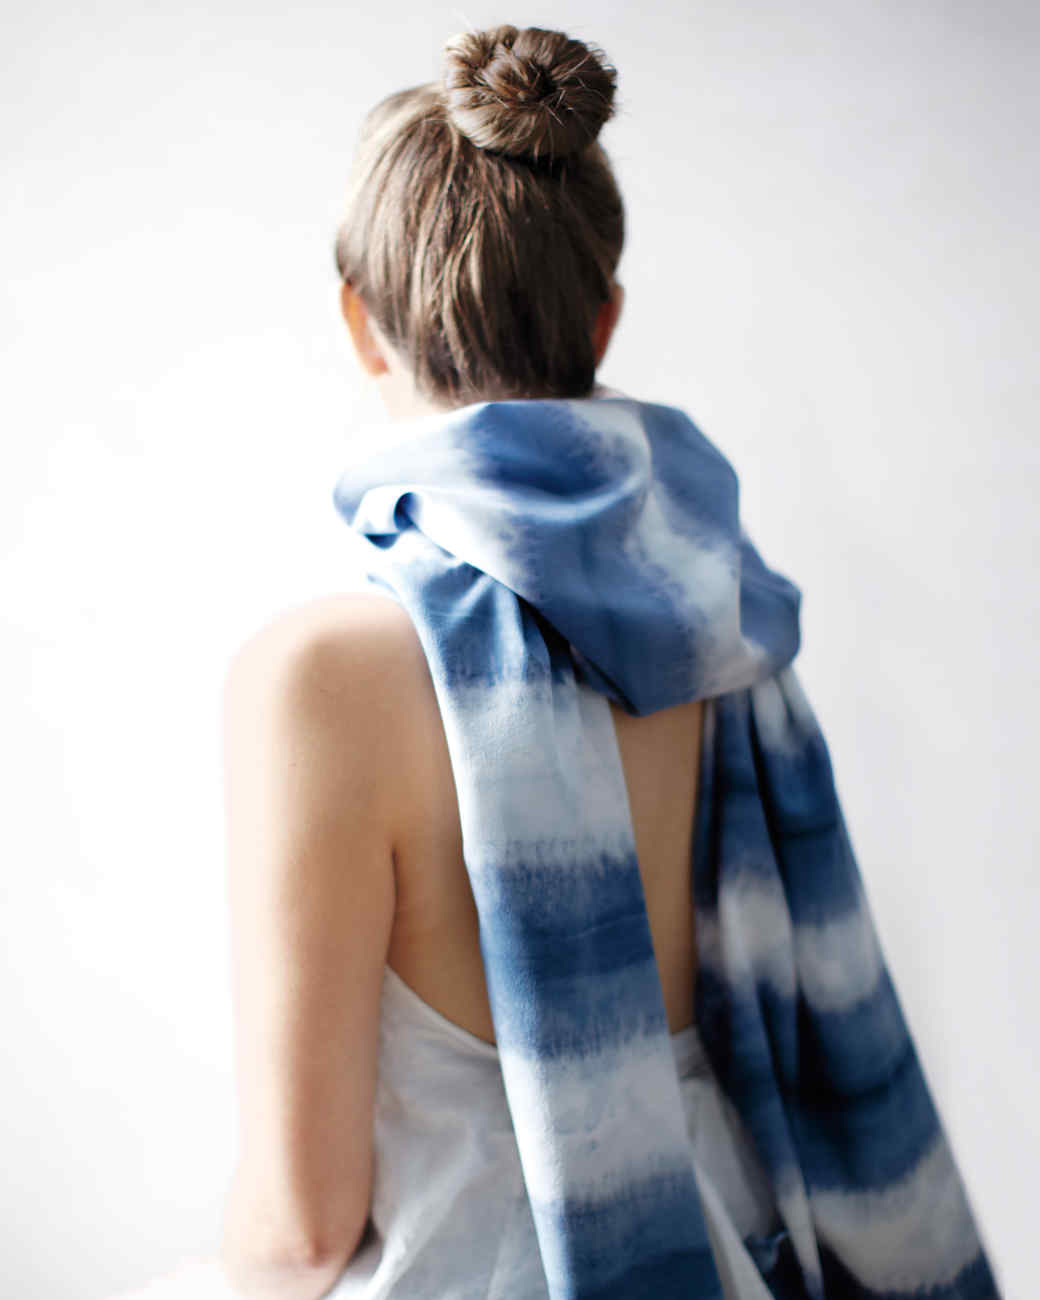 scarf-model-mld108754.jpg